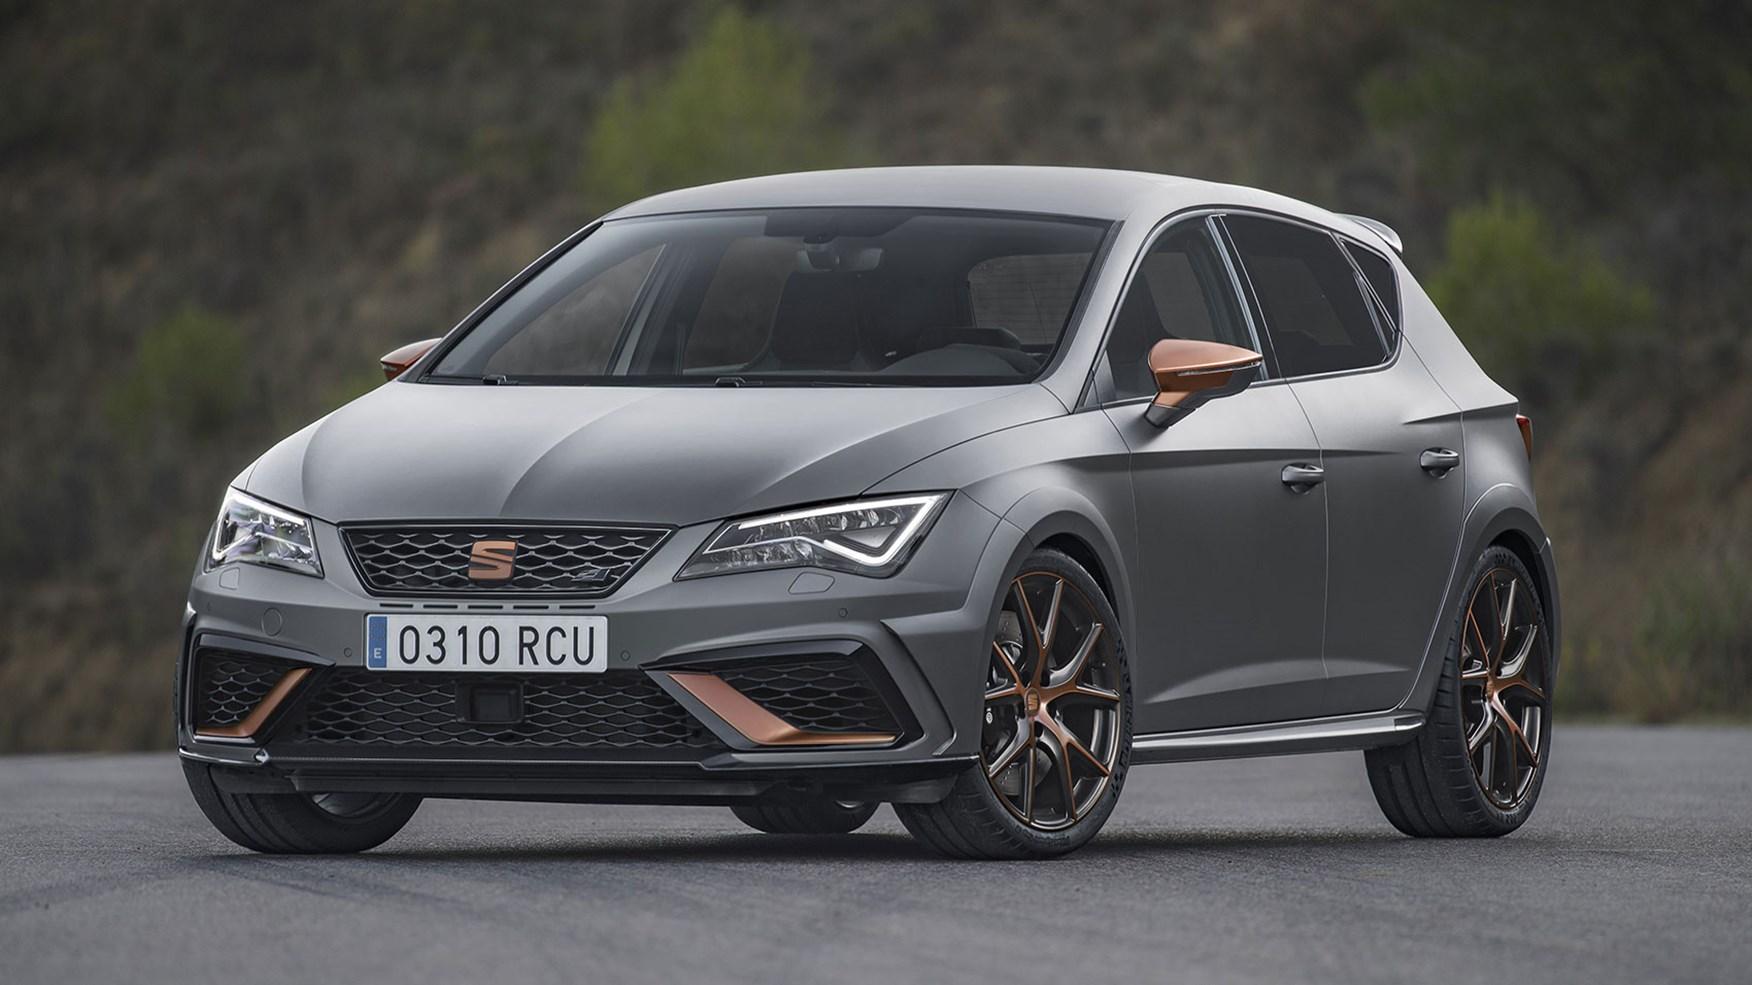 Vw Golf R Estate Review >> Seat Leon Cupra R review: needs more spice | CAR Magazine